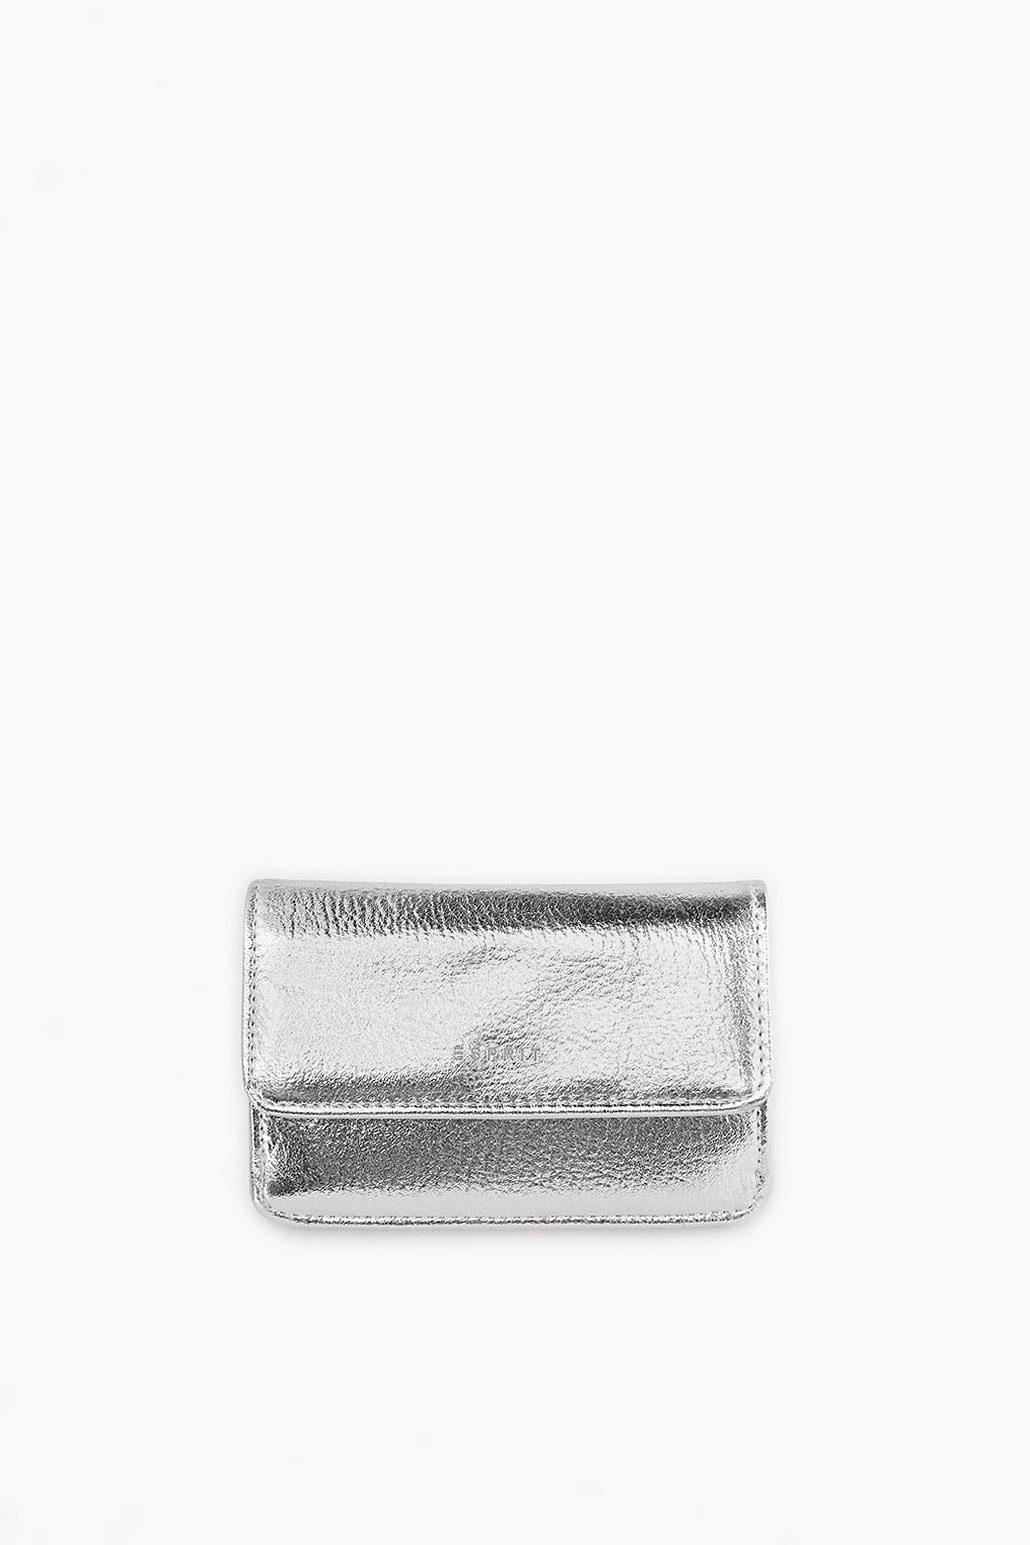 ESPRIT CASUAL Schmaler Geldbeutel im Metallic-Look